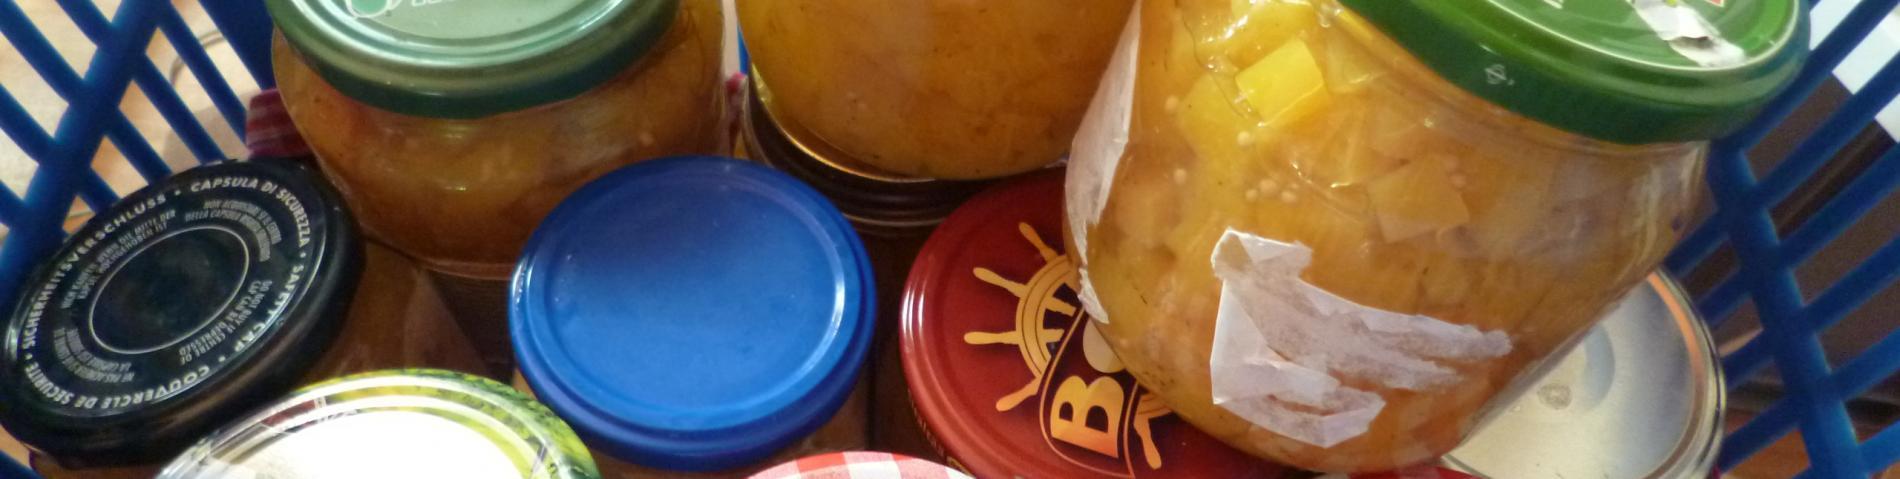 Homemade pickled pumpkins